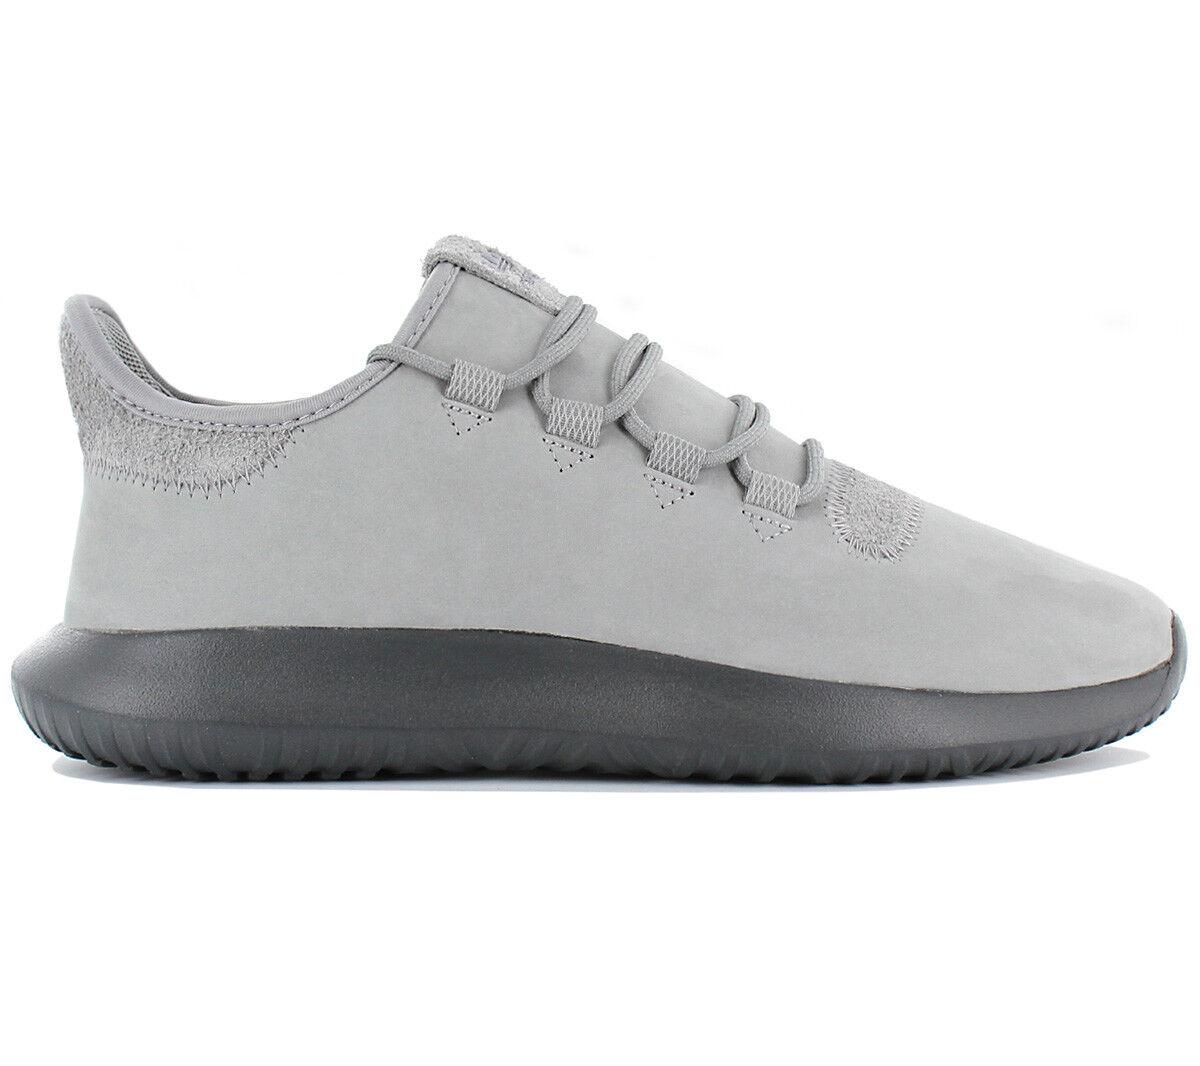 Adidas Tubular Leather Baskets Originals Shadow RzRxH7